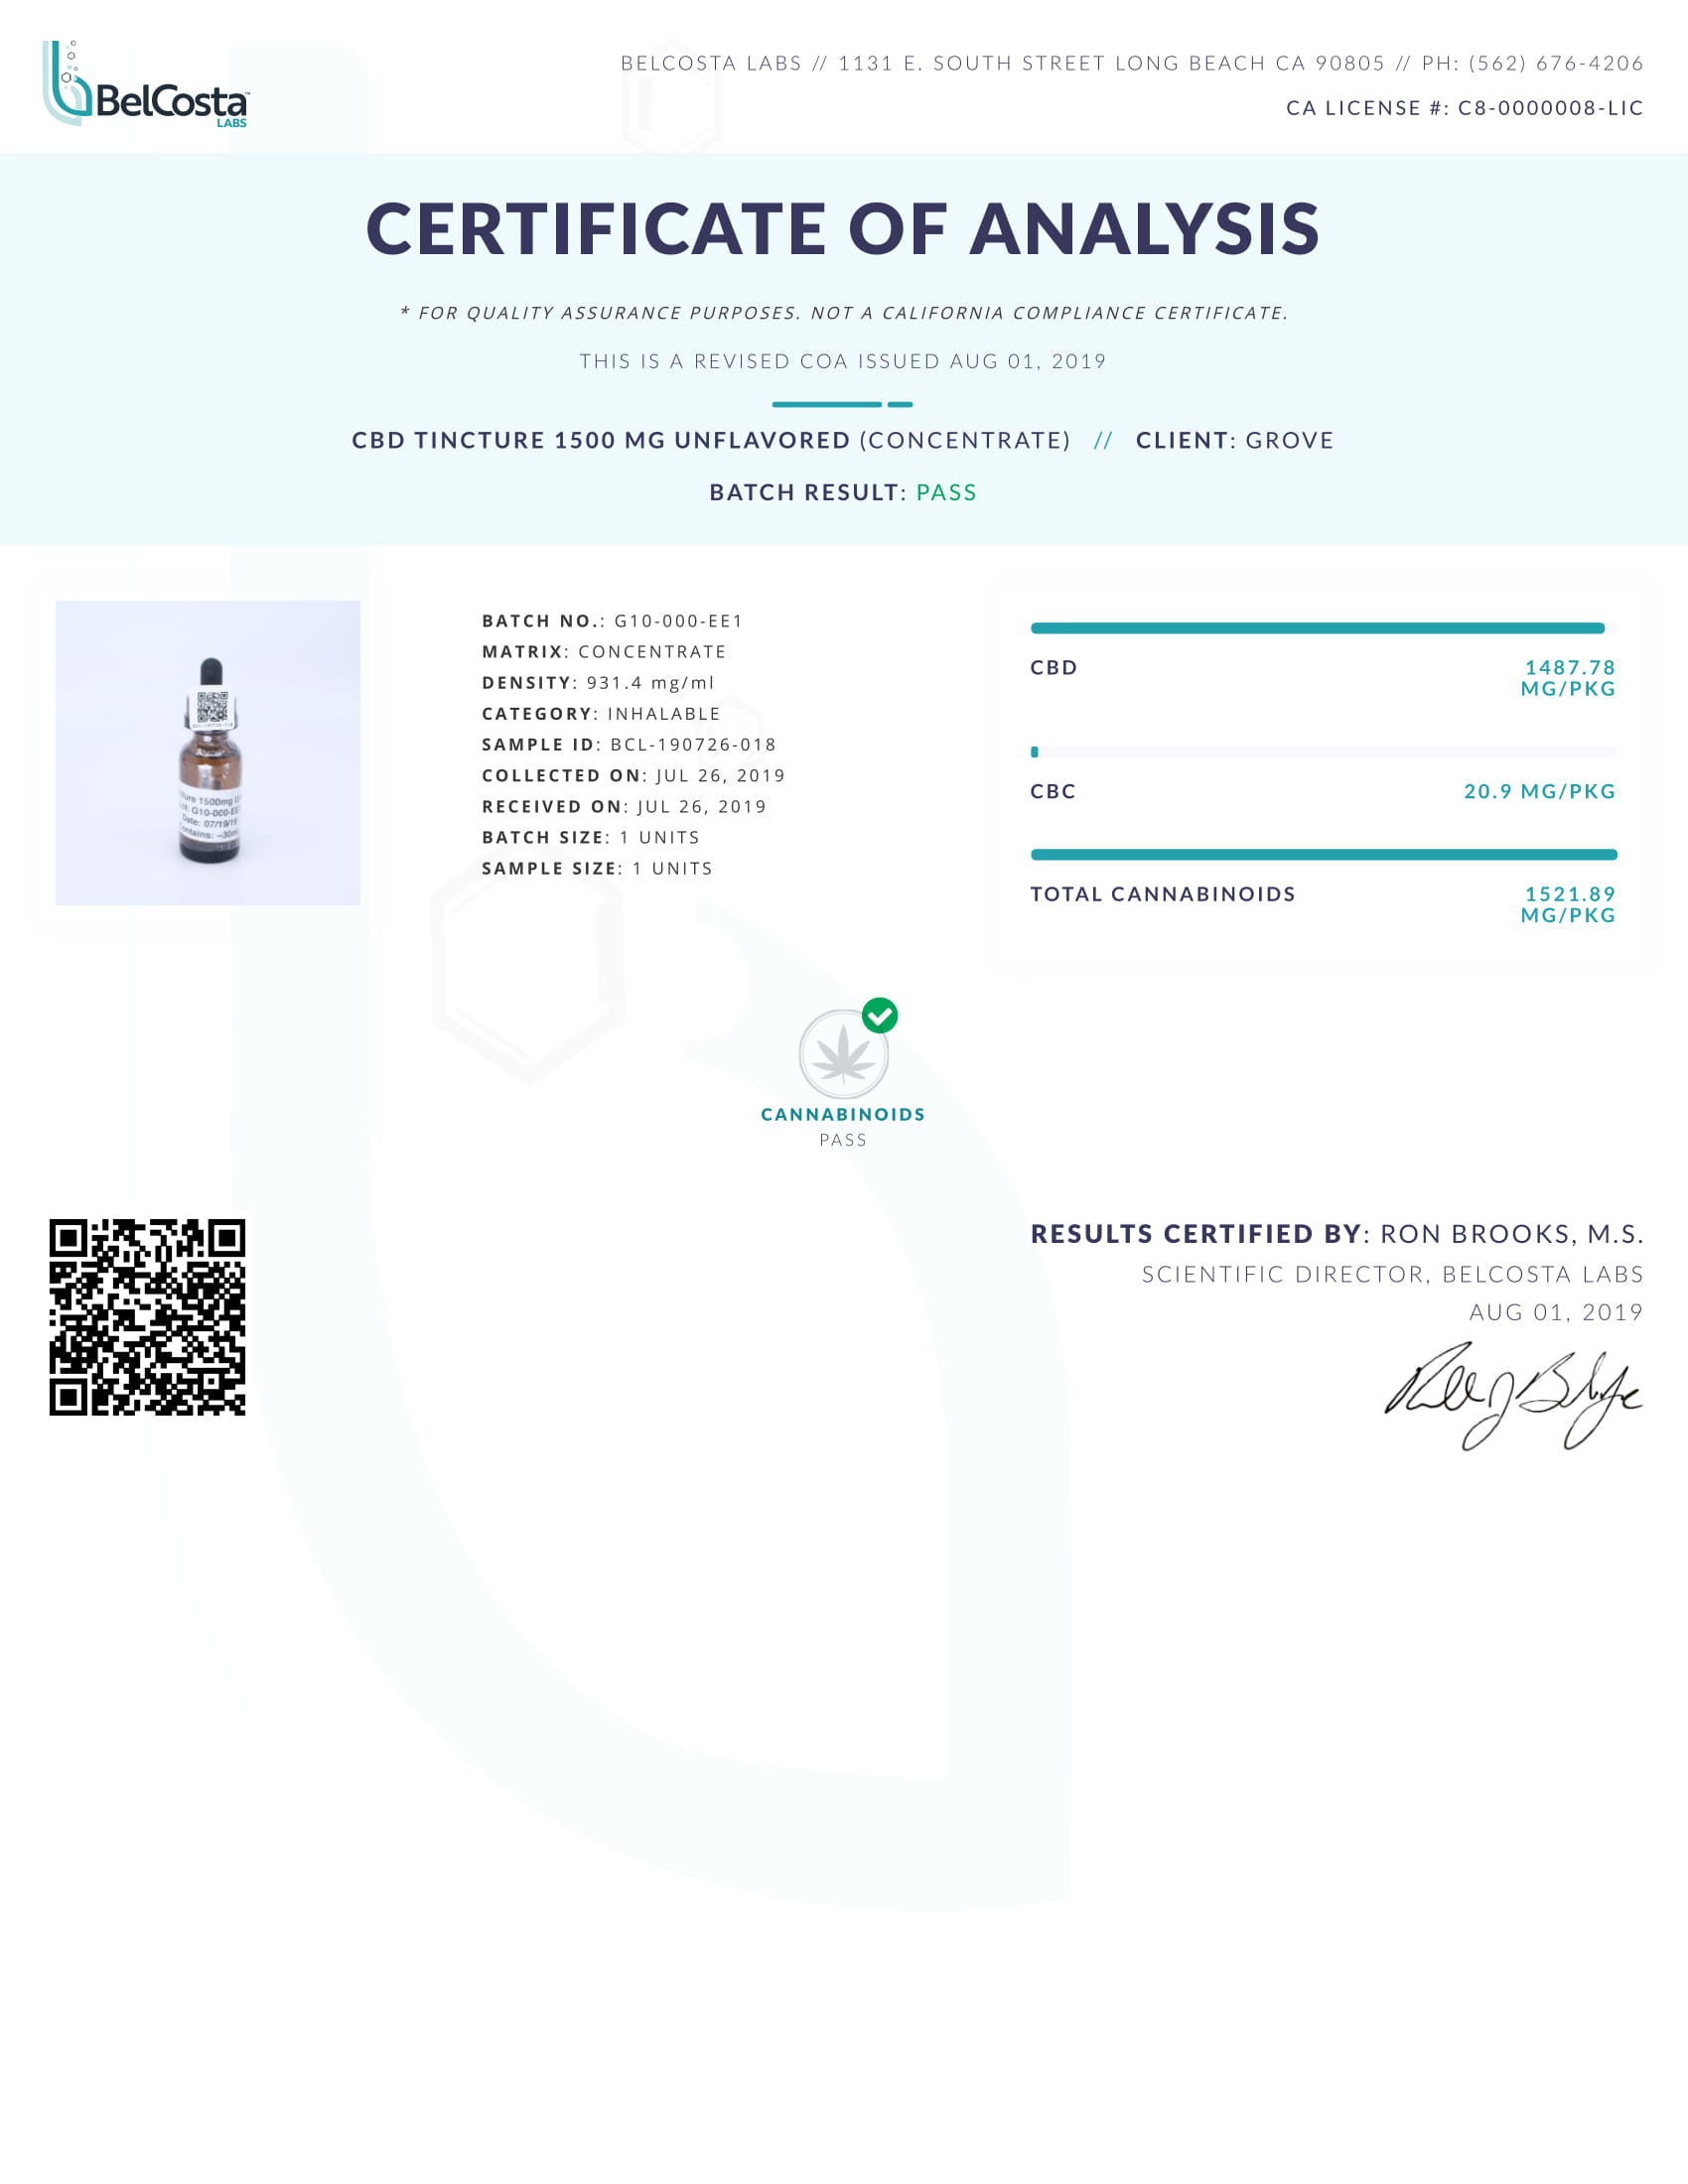 GRN CBD Oil Tincture Unflavored Lab Report Broad Spectrum 1500mg